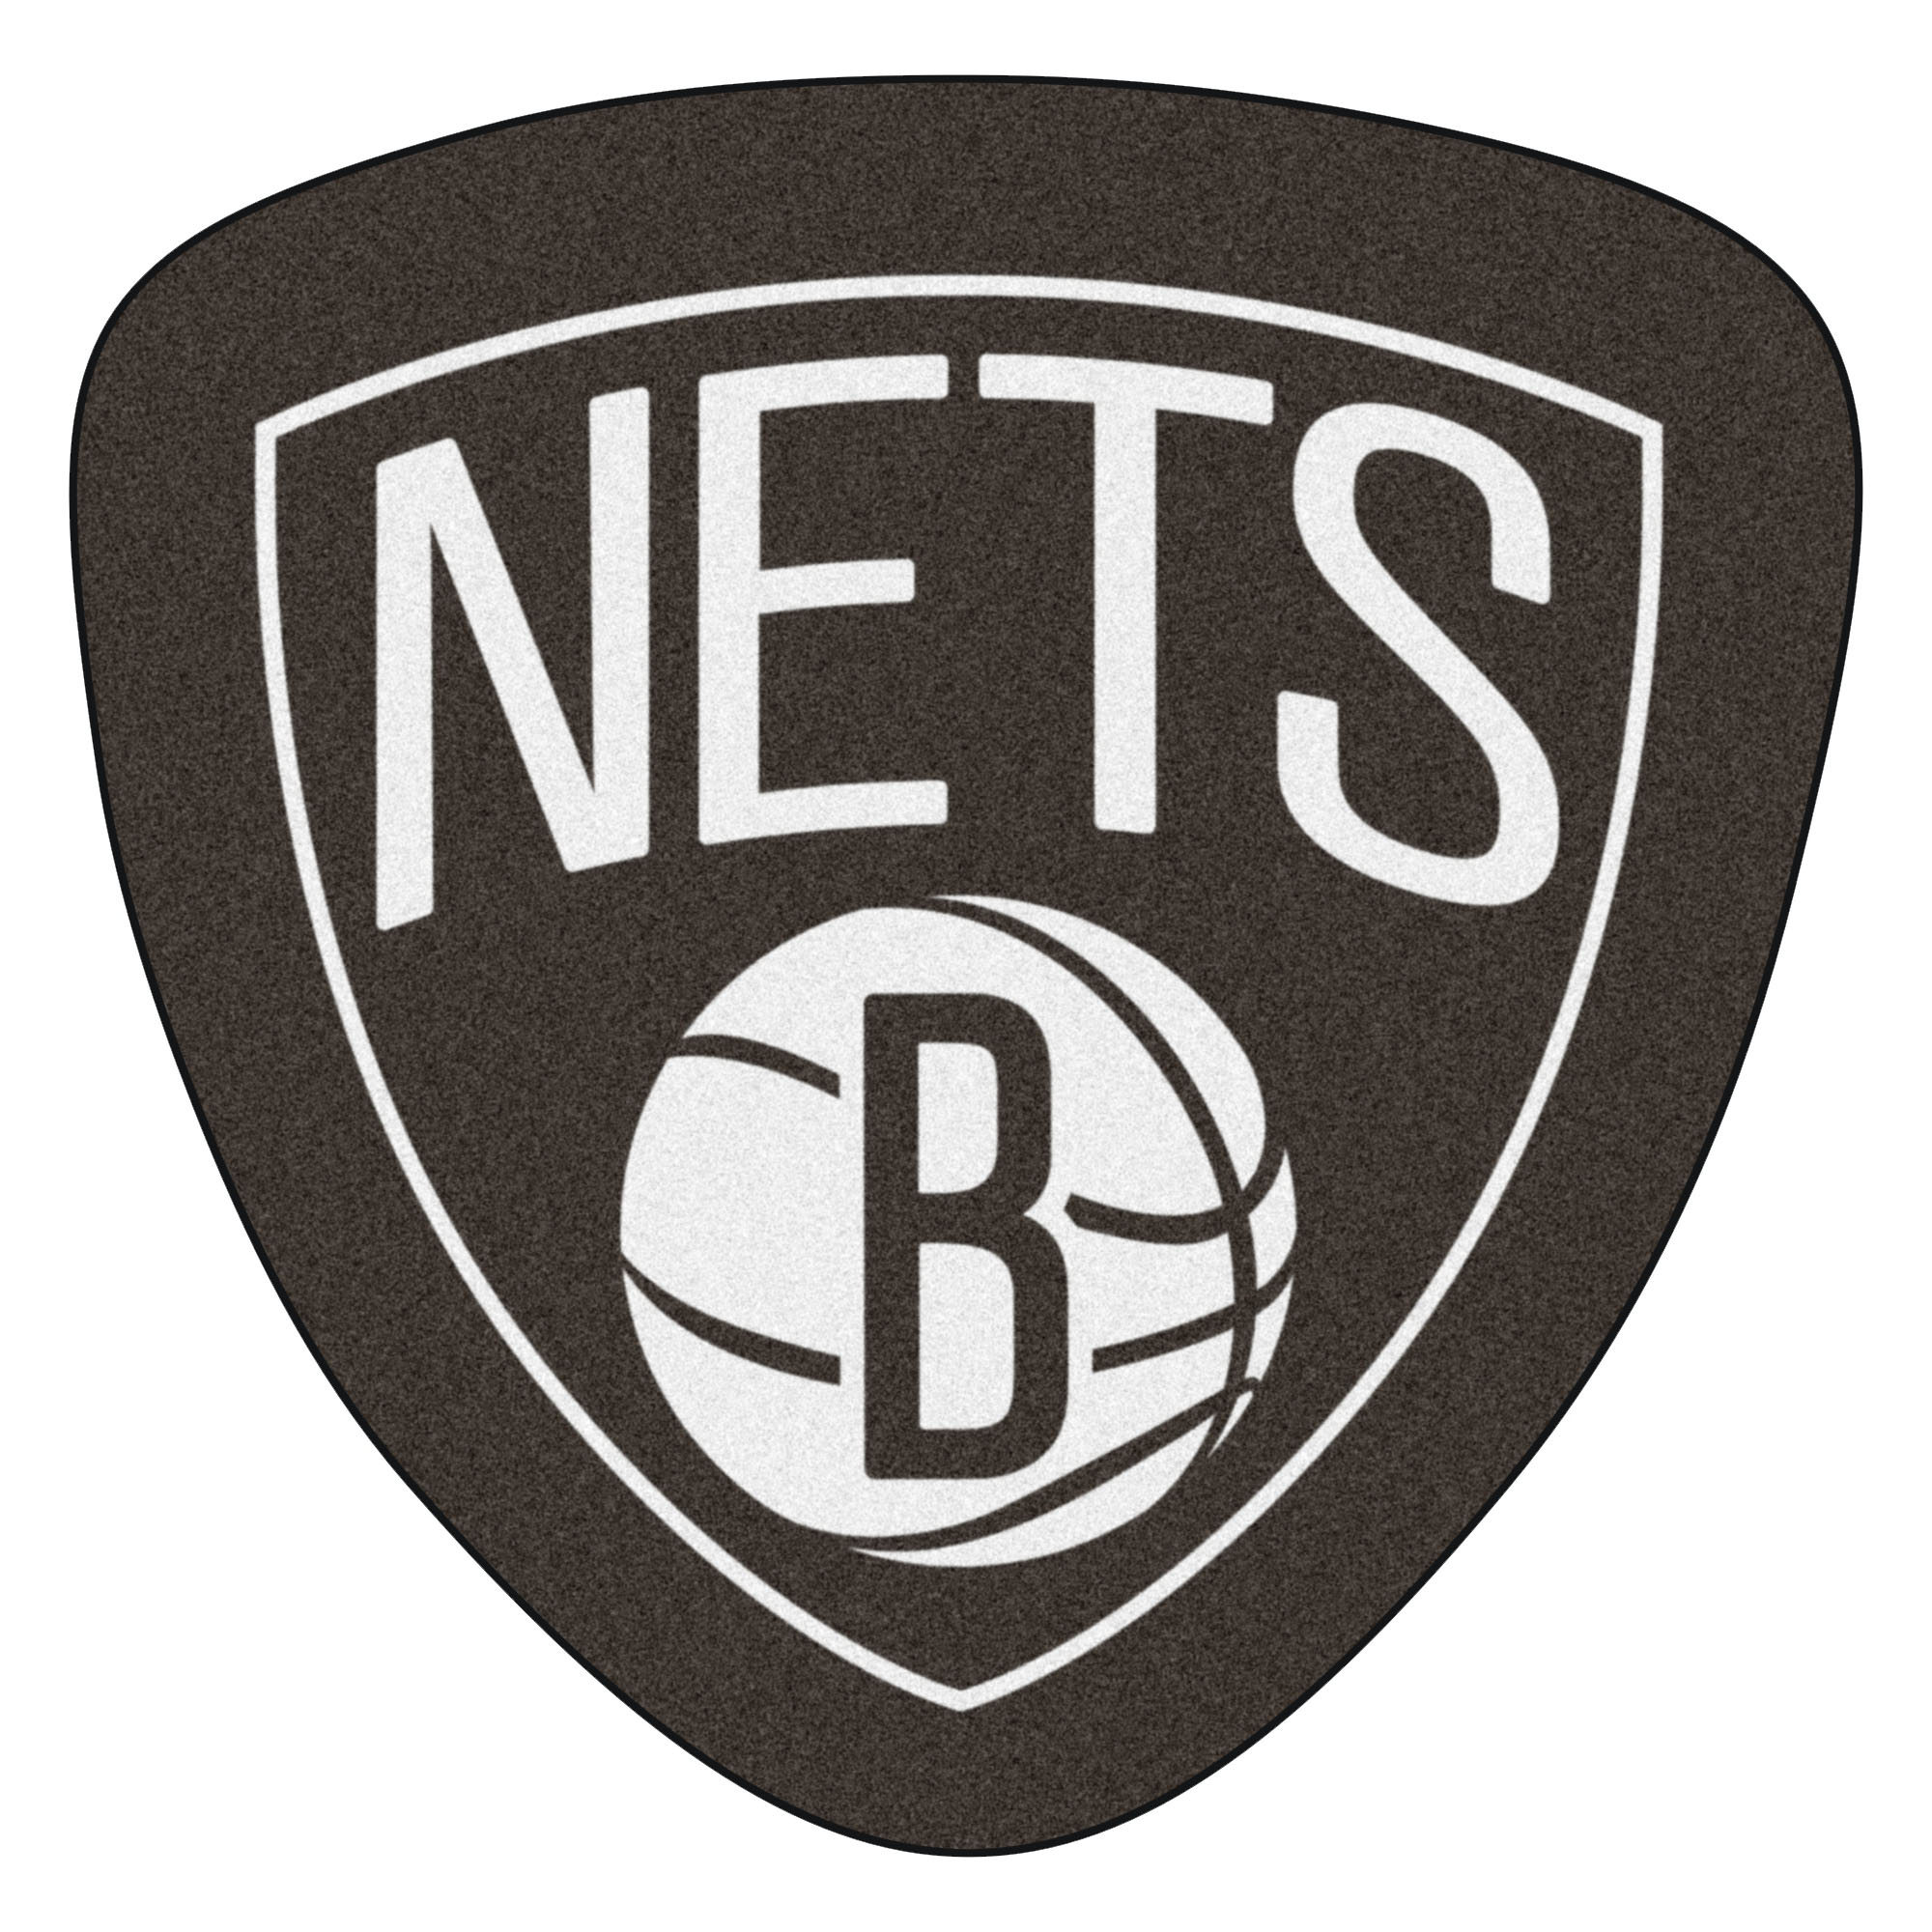 NBA Brooklyn Nets Mascot Novelty Logo Shaped Area Rug